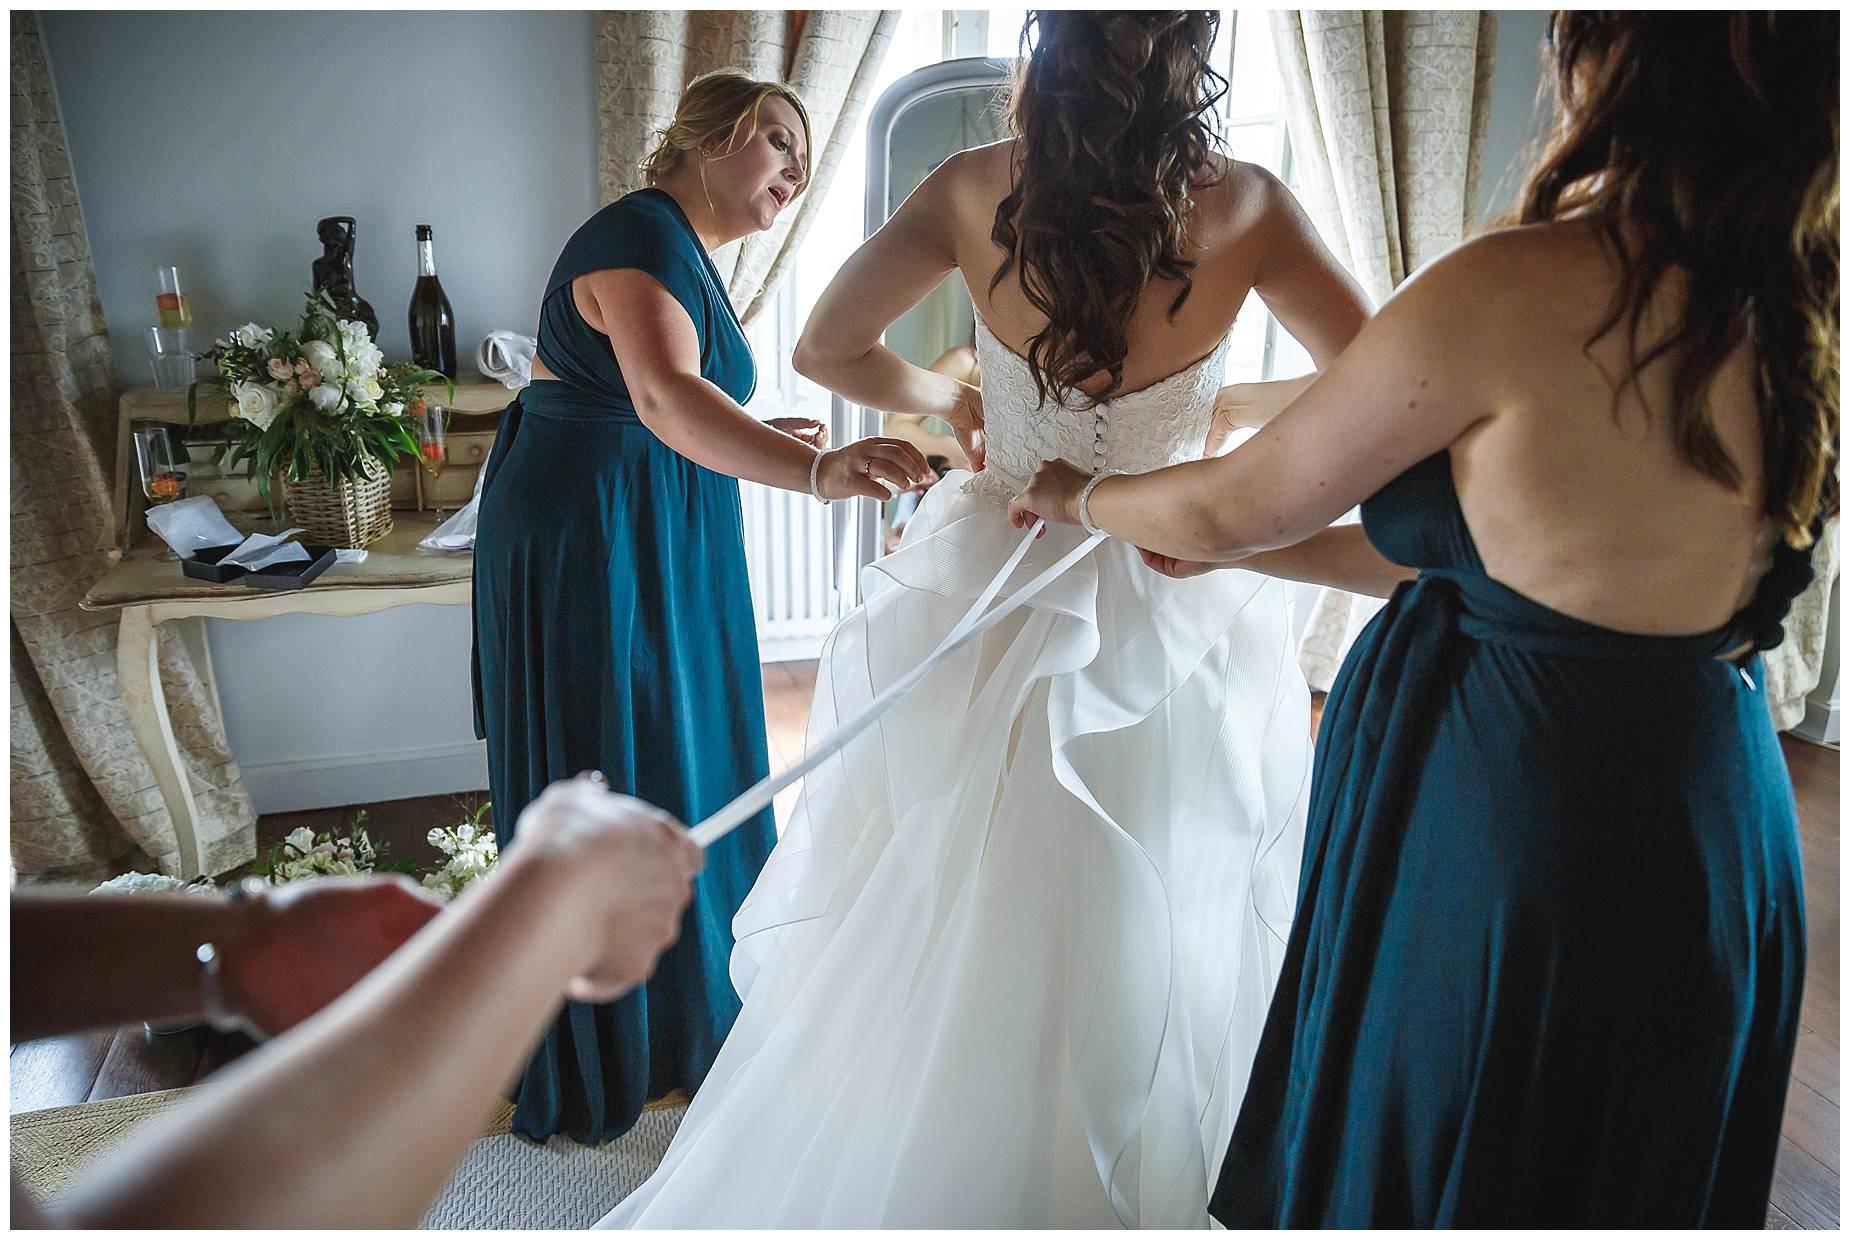 tying dress